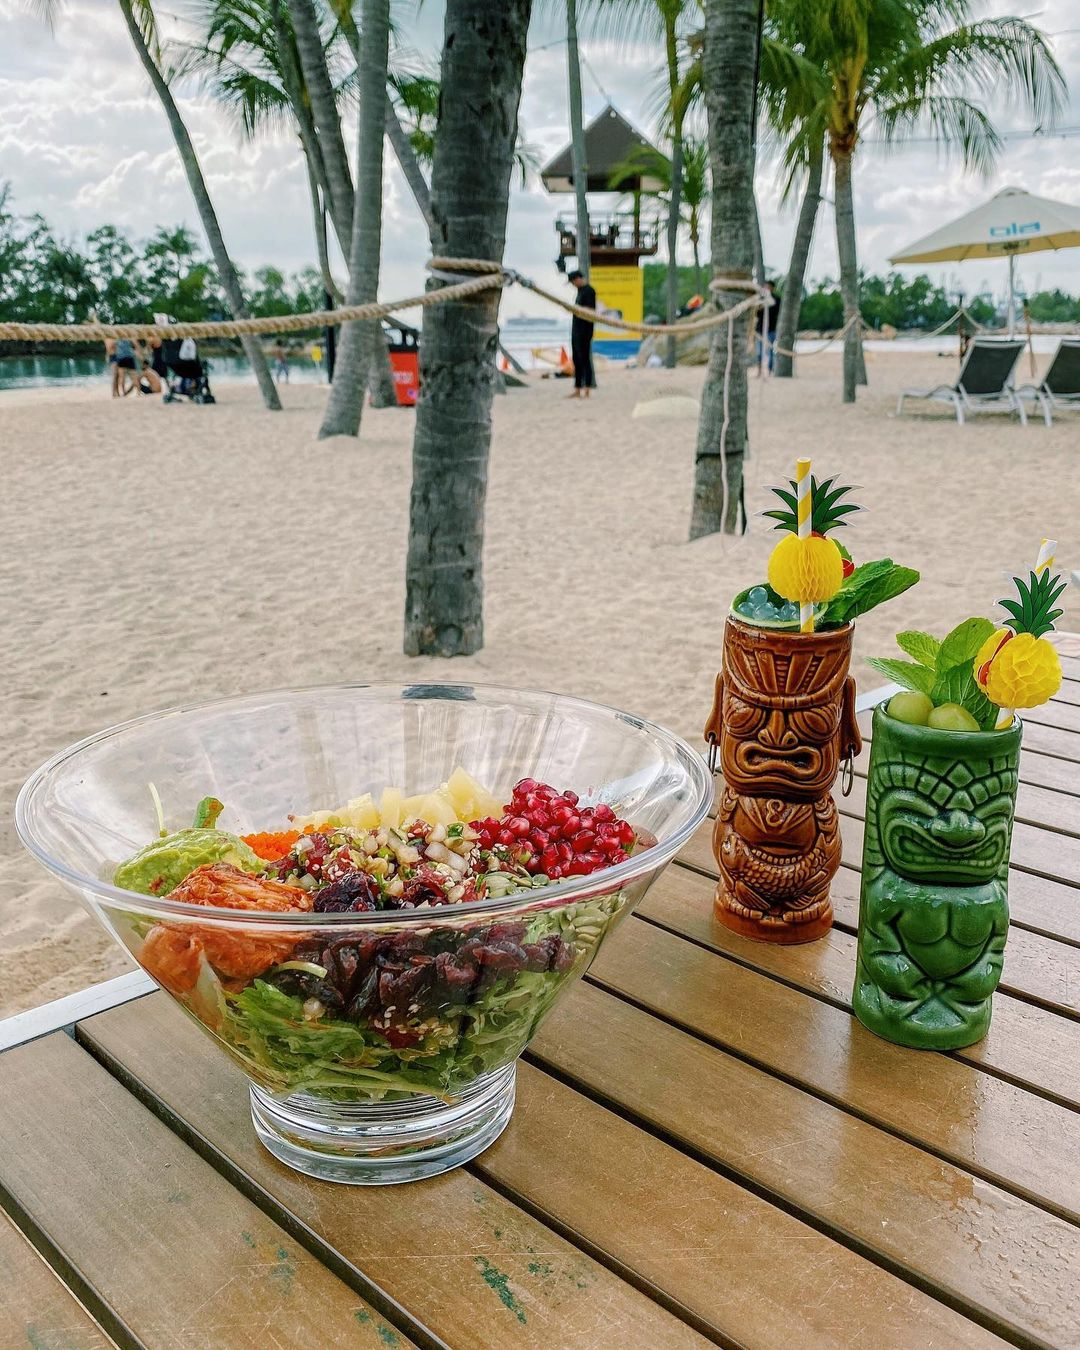 Ola Beach Club - tiki drinks and poke bowls